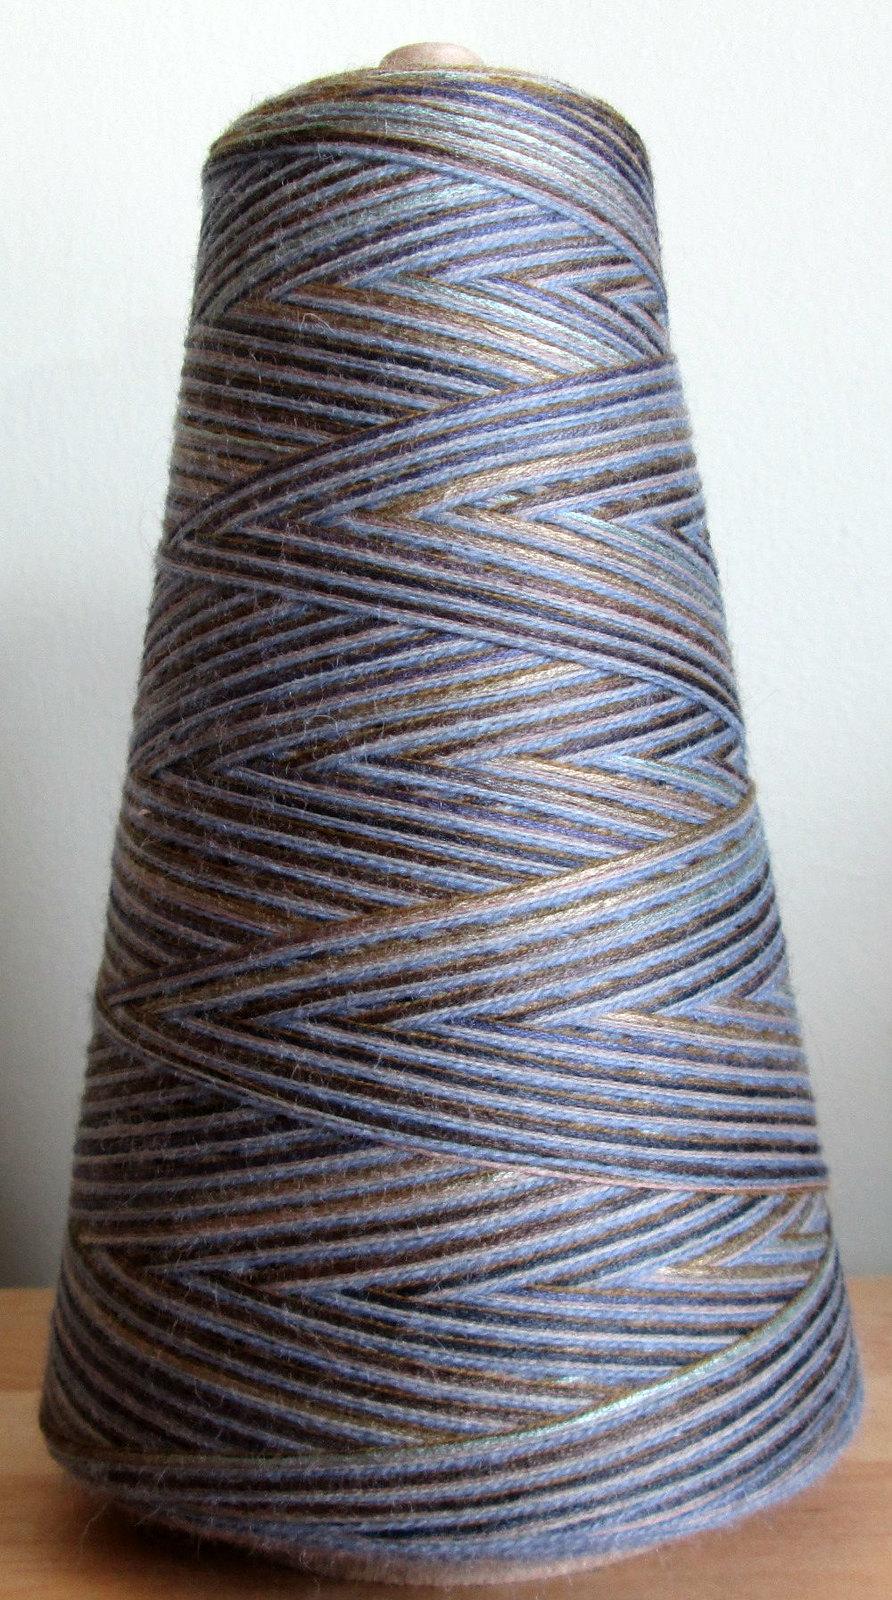 Knitting Different Yarn Weights : Dk weight knitting yarn chronicles of yarnia